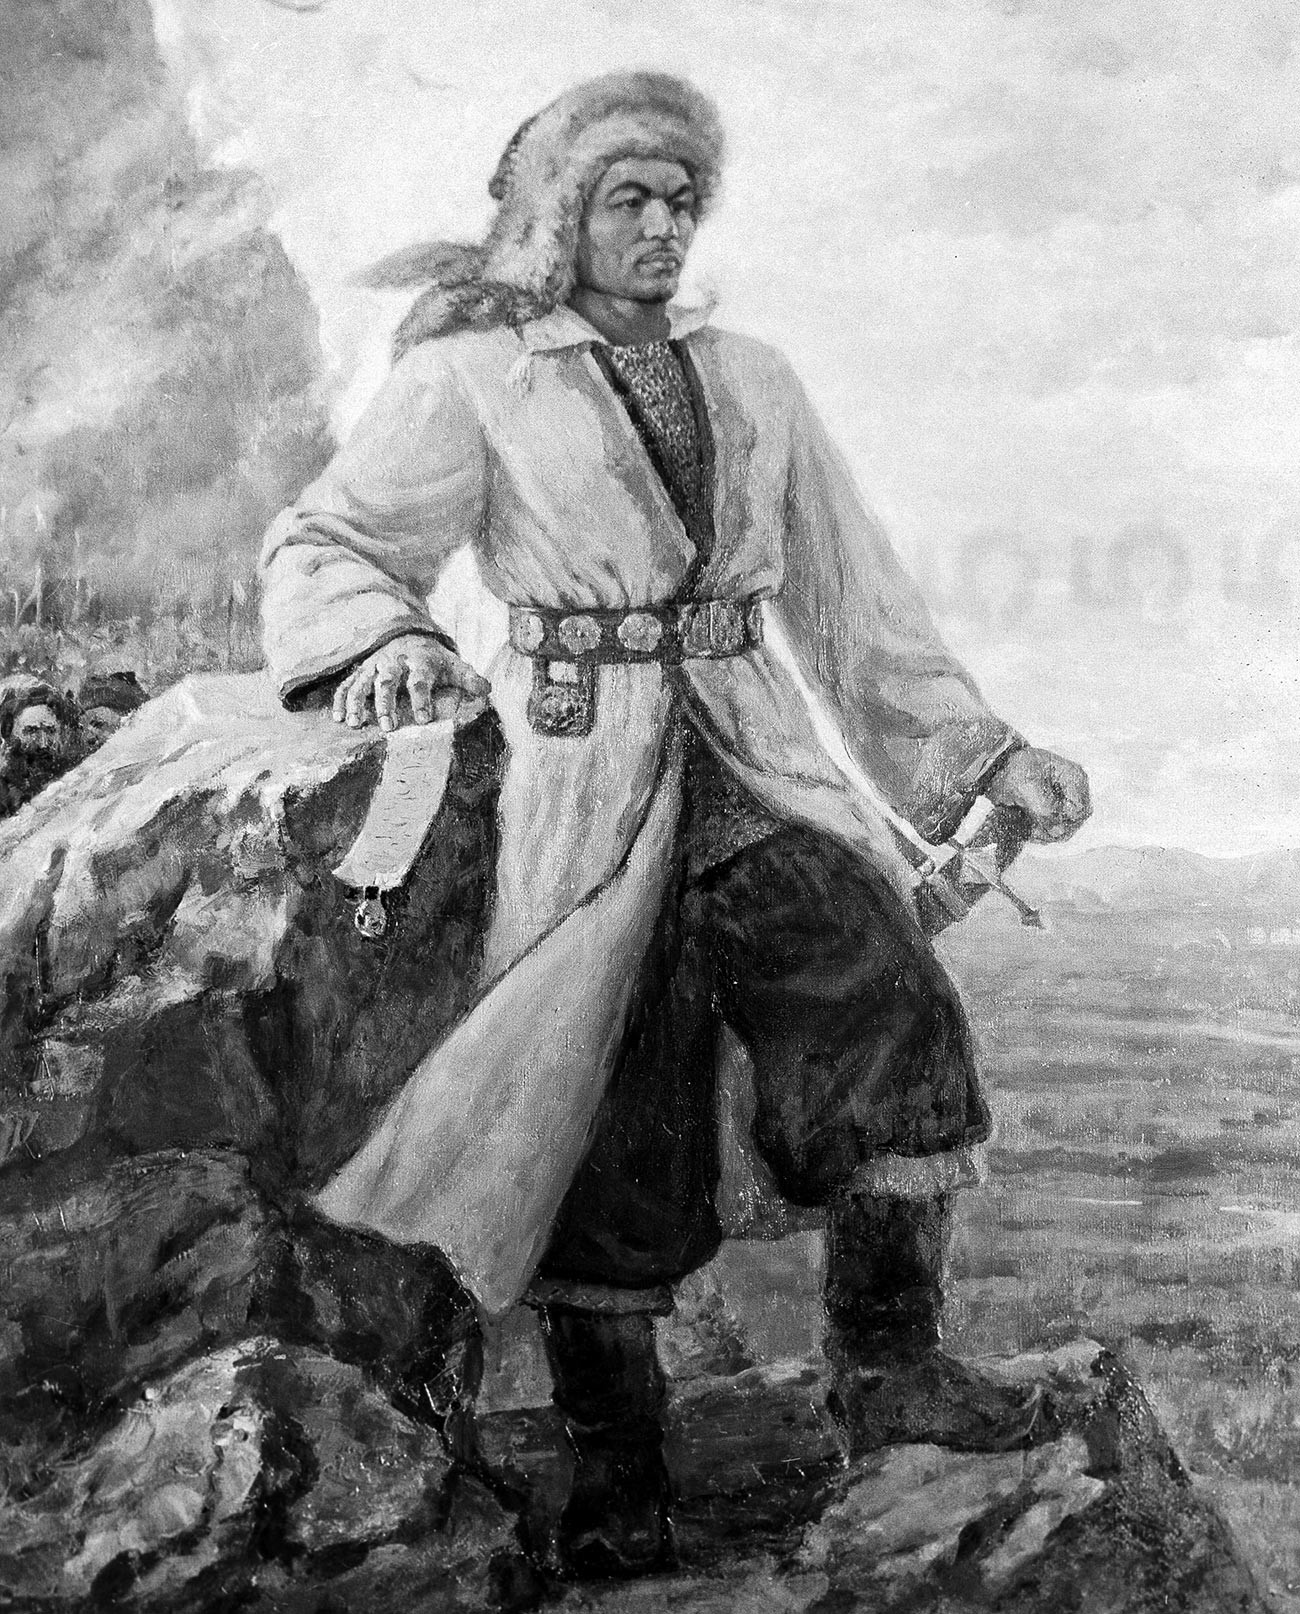 Potret pertama Salavat Yulayev dalam seni Bashkir, digambar oleh Gabdulla Mustafin pada 1957.